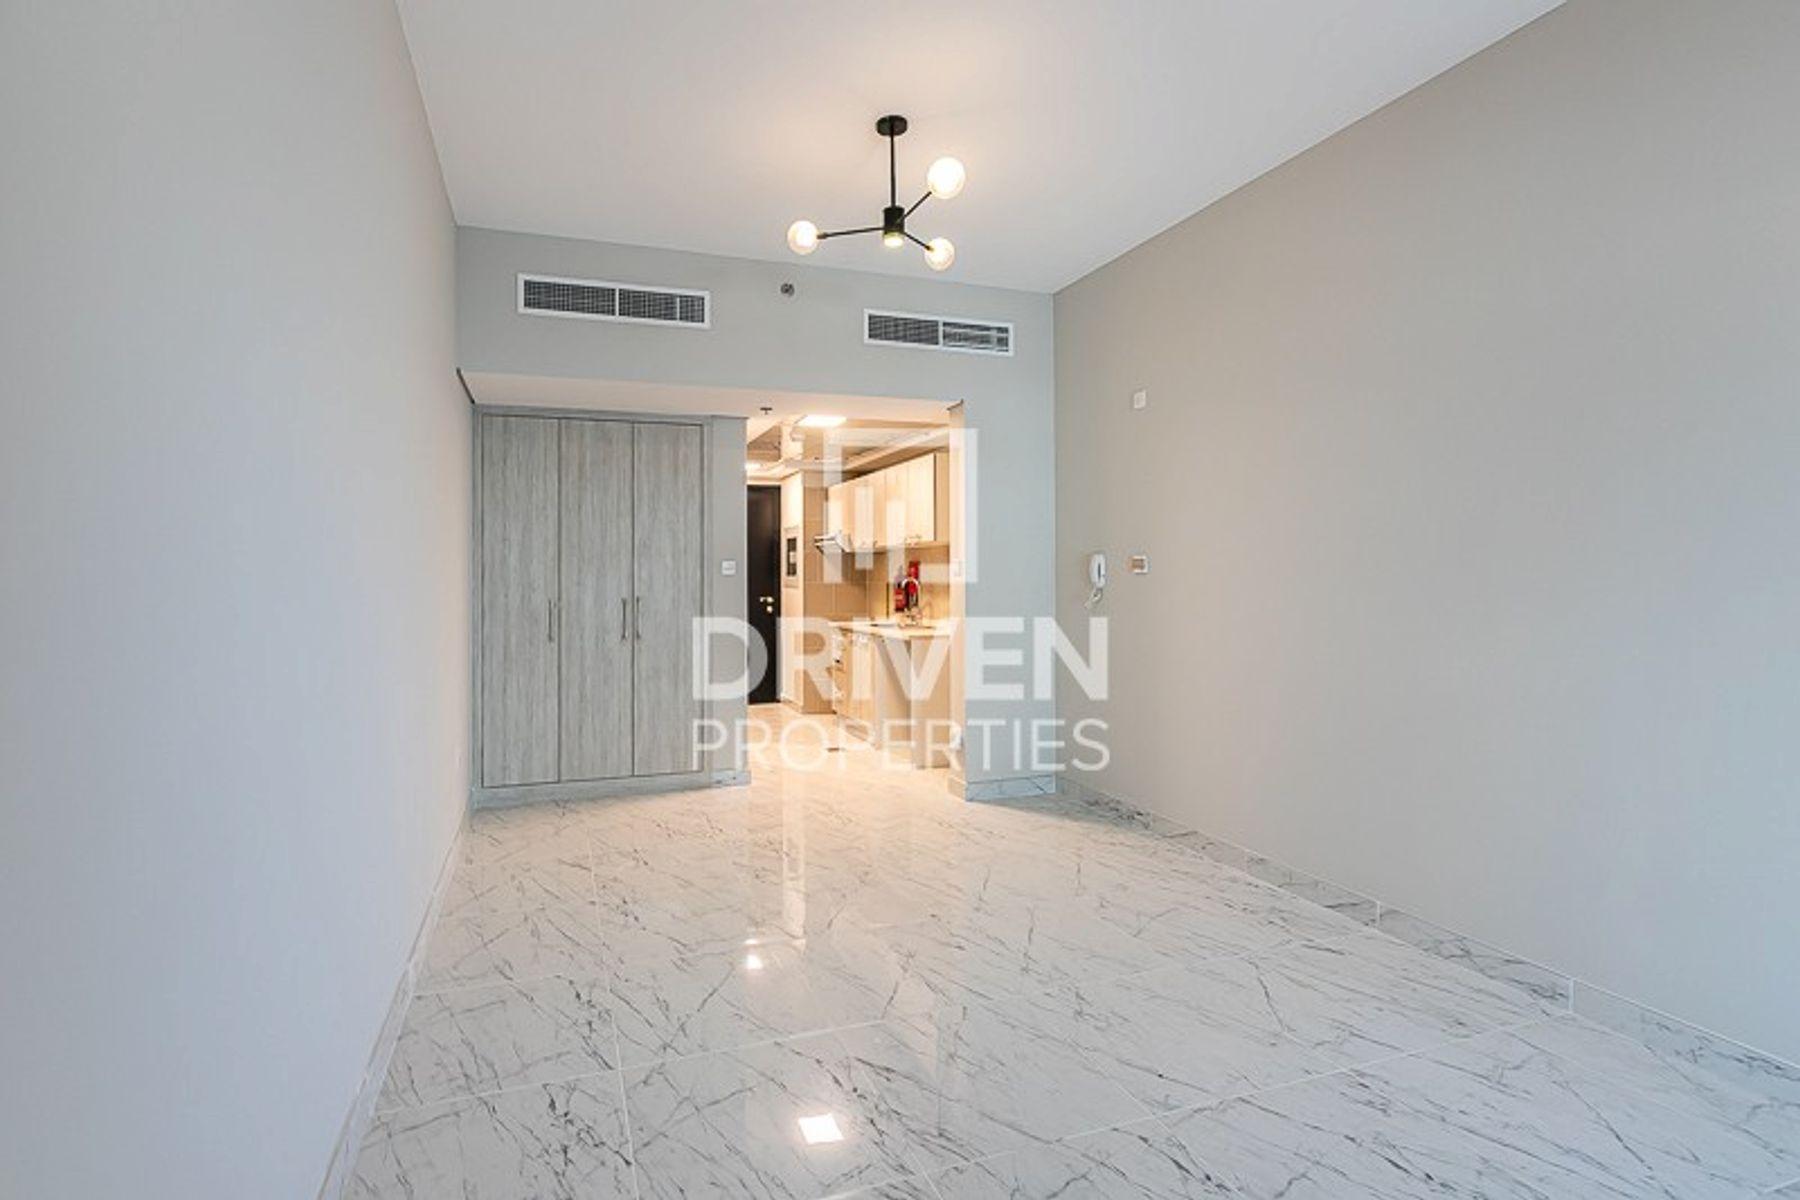 Studio for Rent in MAG 560, Dubai South (Dubai World Central)